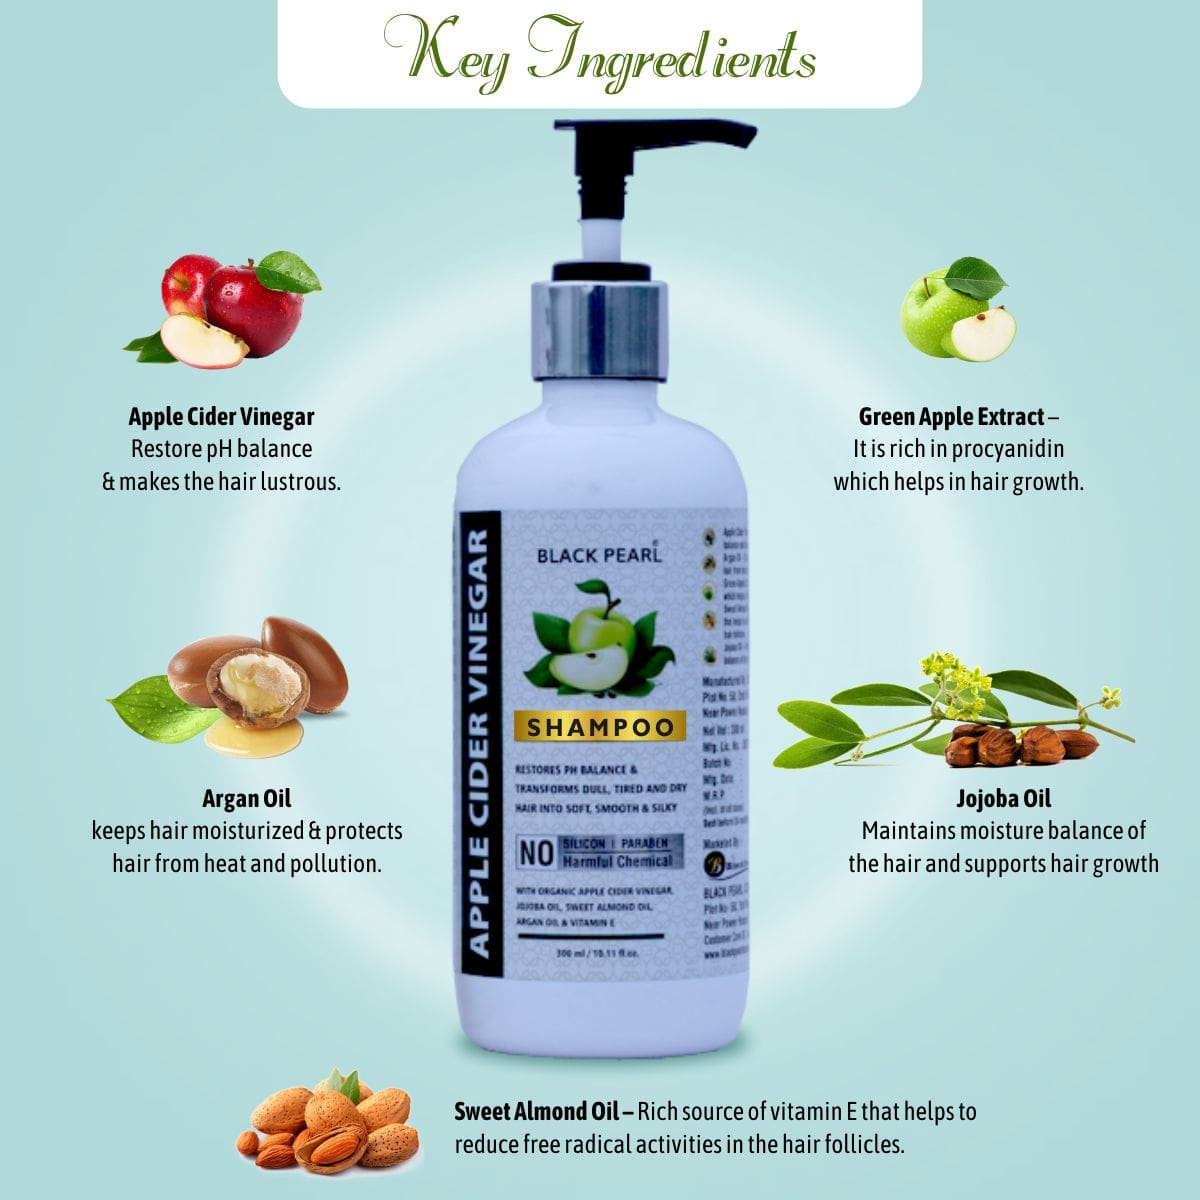 Apple Cider Vinegar Shampoo Key Ingredients